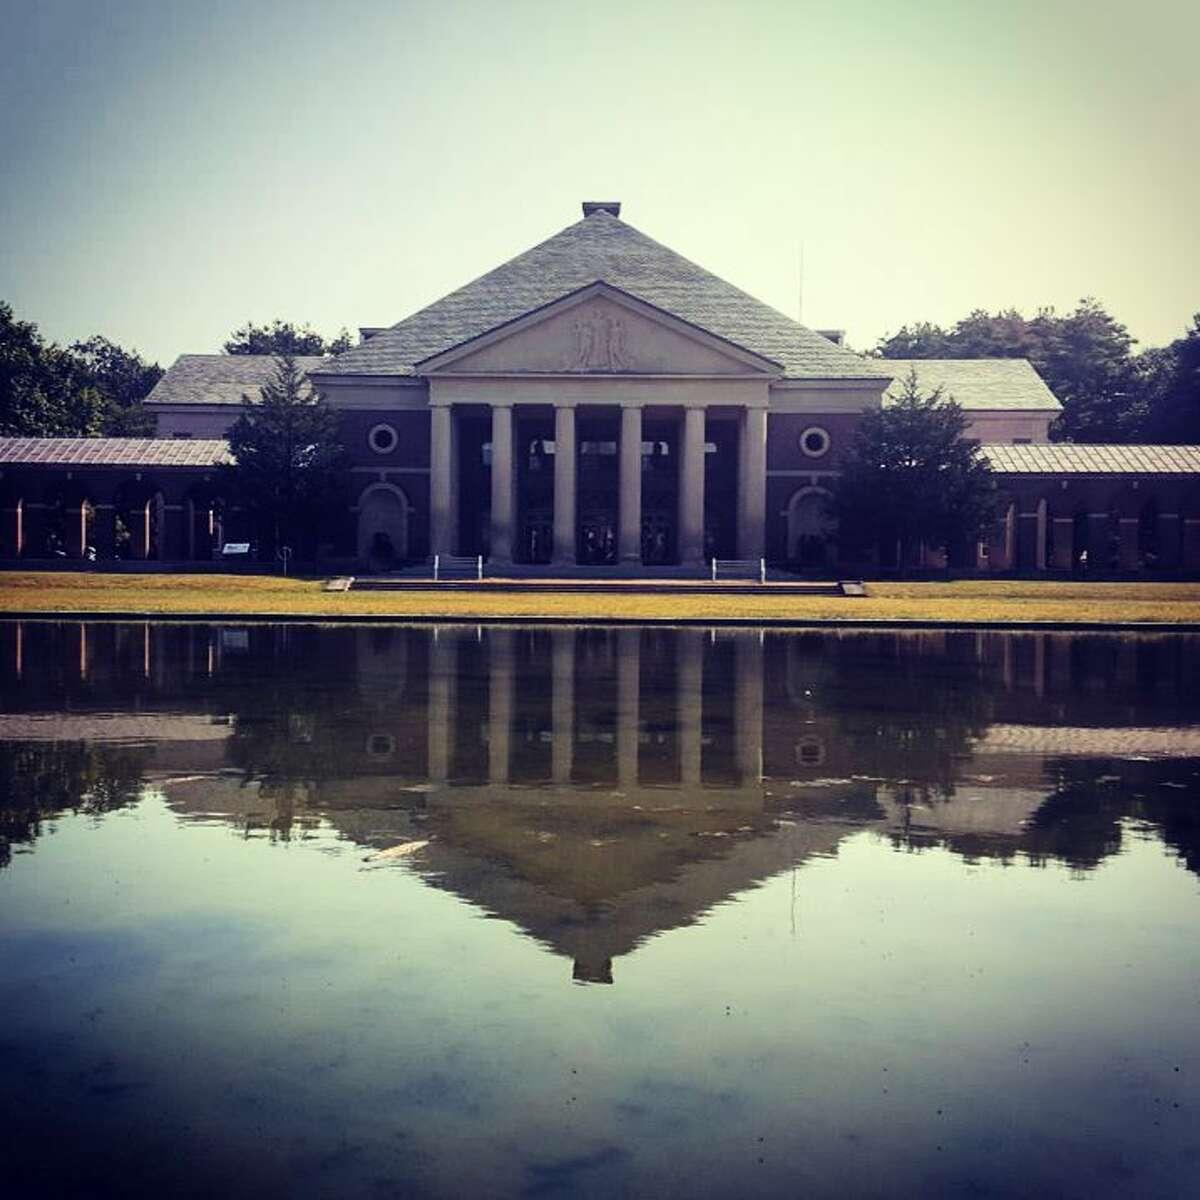 Saratoga Performing Arts Center: